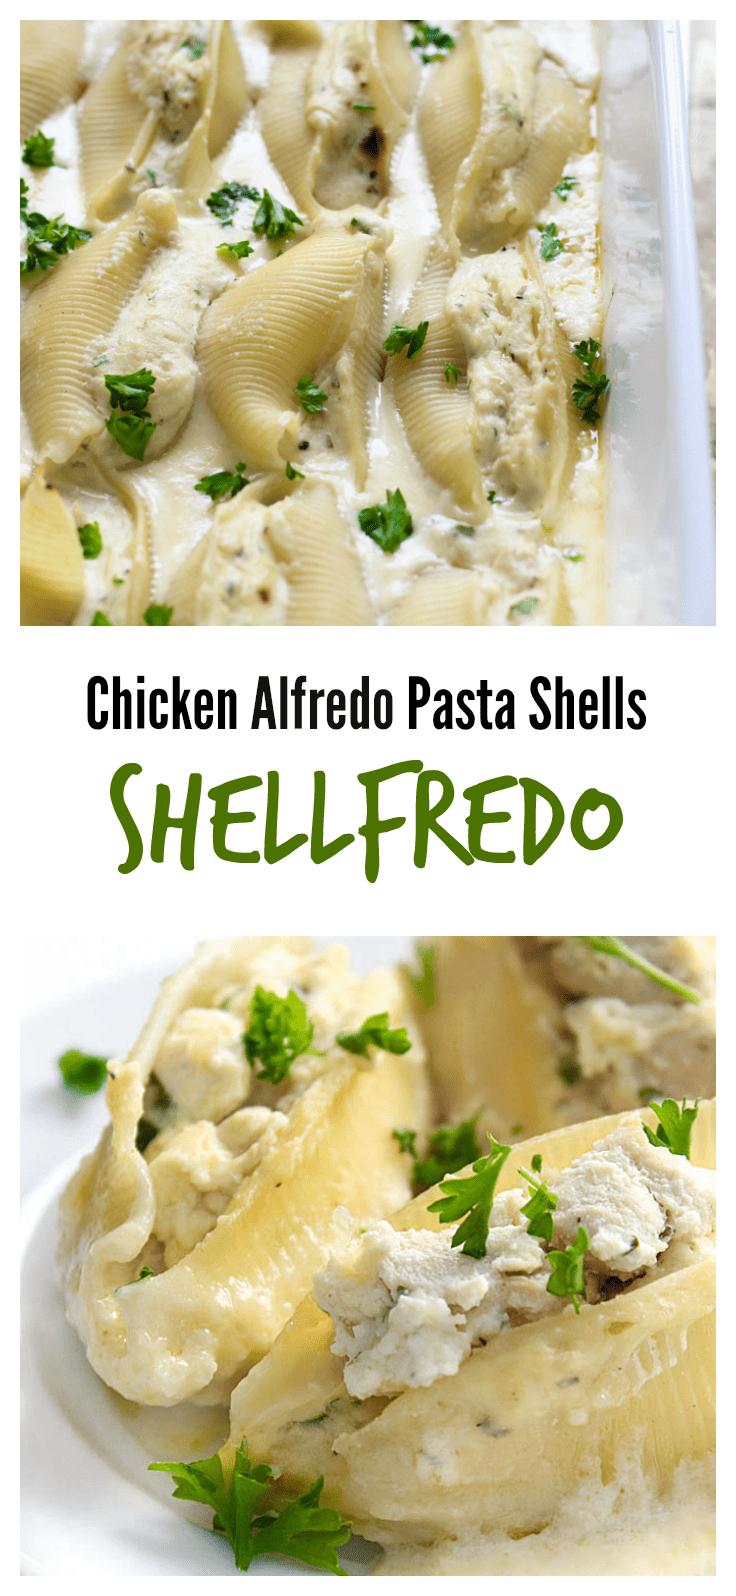 Chicken Alfredo pasta shells are decadent and delicious. These shellfredos have ricotta chicken stuffed shells swimming in a rich Alfredo sauce.